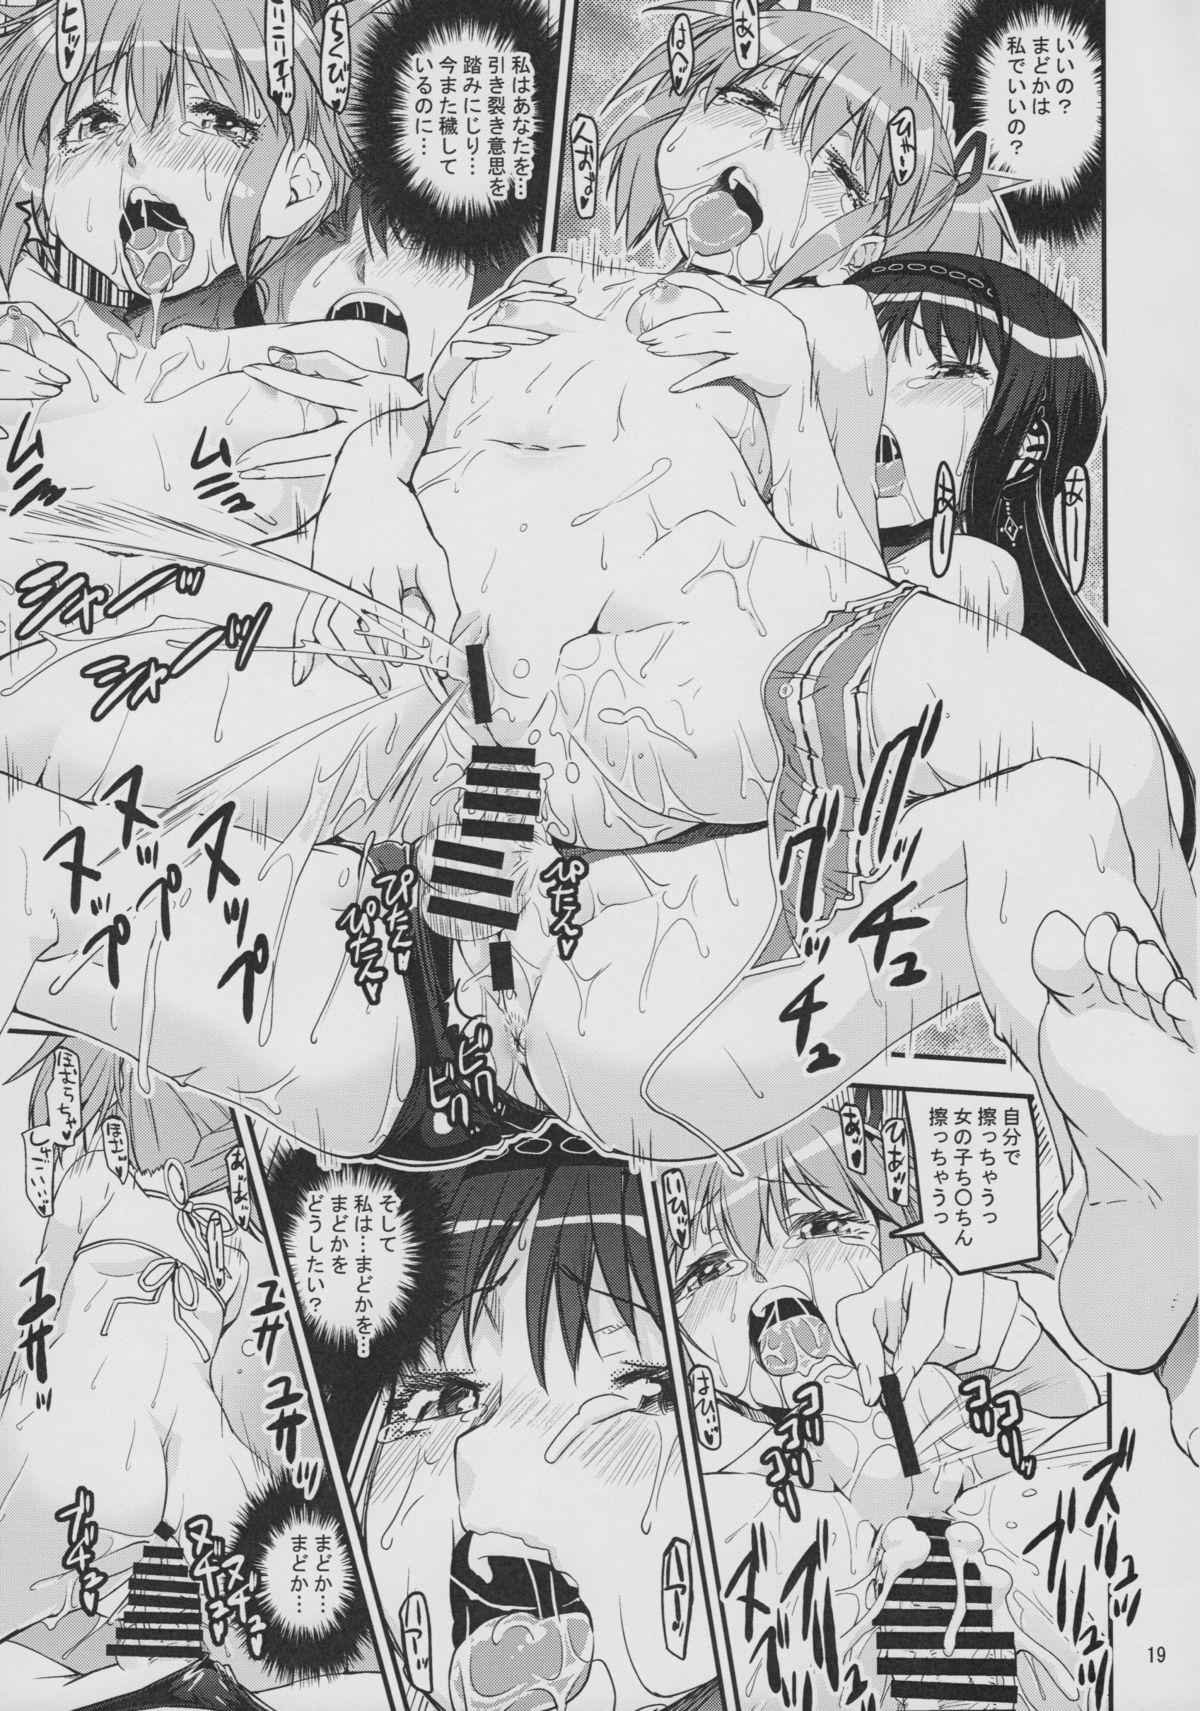 (C86) [KATAMARI-YA (Kanetsuki Masayoshi, Shinama) DevilAX (Puella Magi Madoka Magica) 18